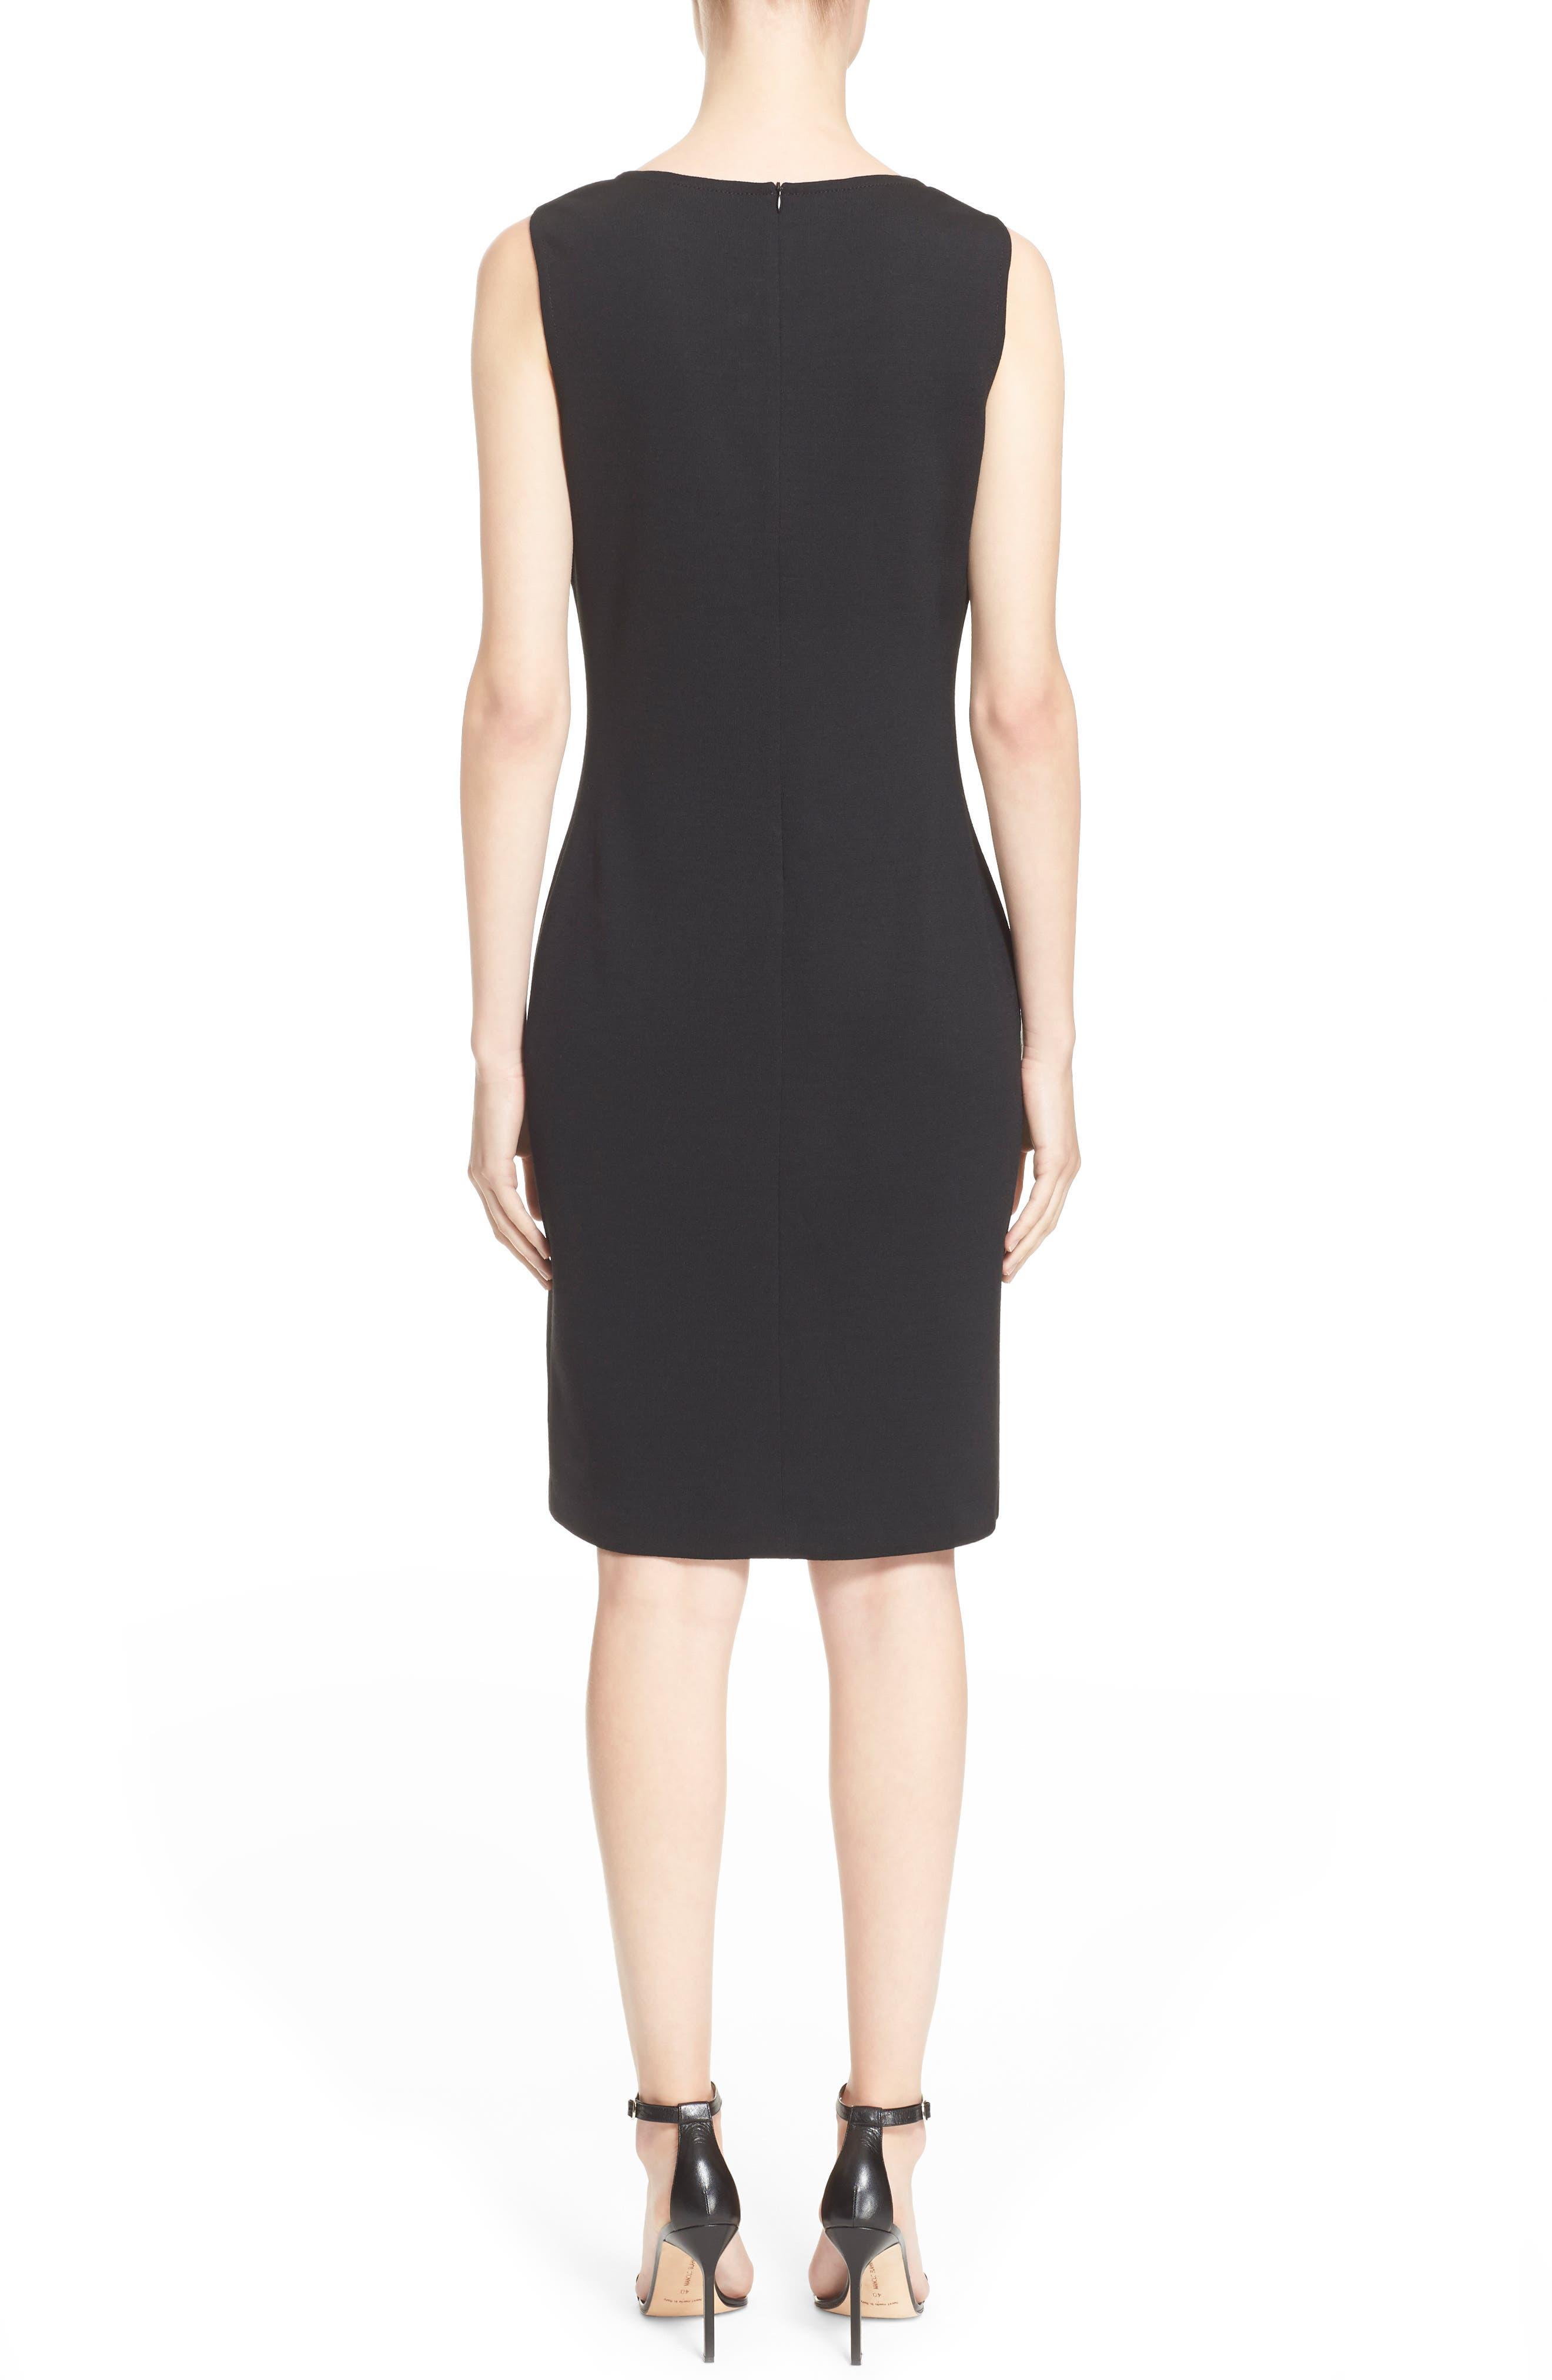 ST. JOHN COLLECTION, Milano Knit Sheath Dress, Alternate thumbnail 2, color, CAVIAR